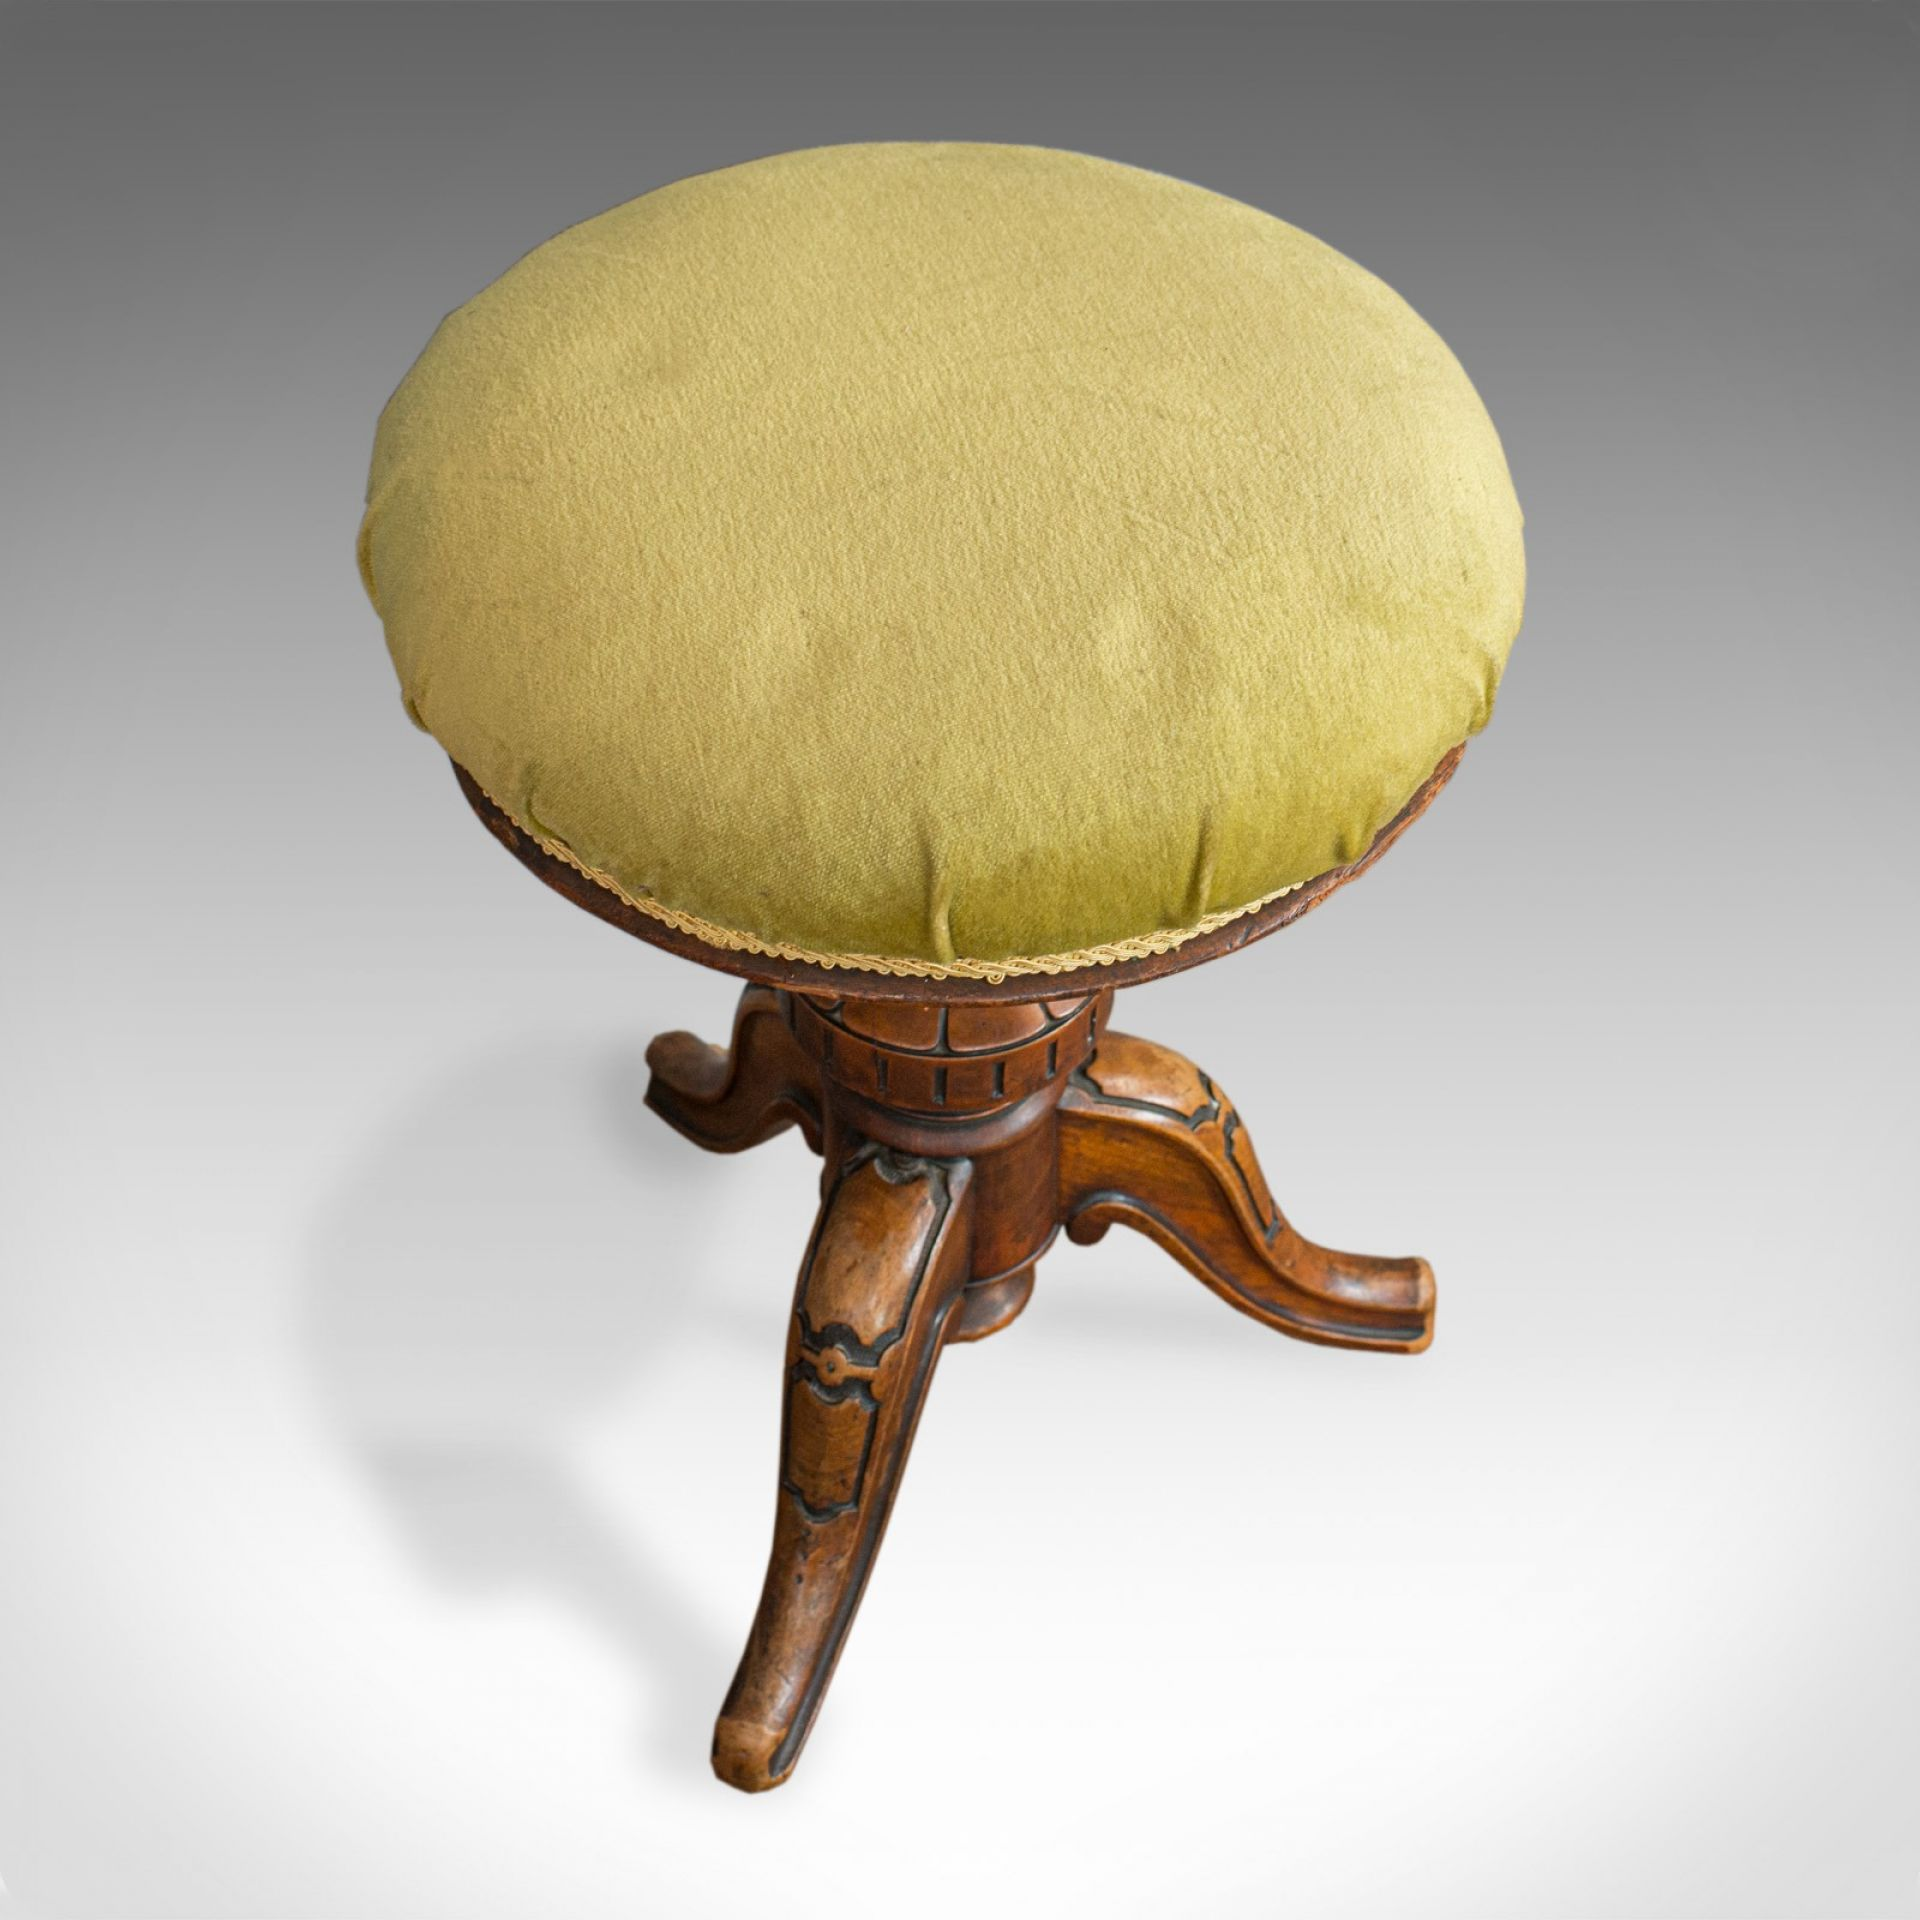 Antique Adjustable Piano Stool, English, Victorian, Walnut, Music, Seat c.1870